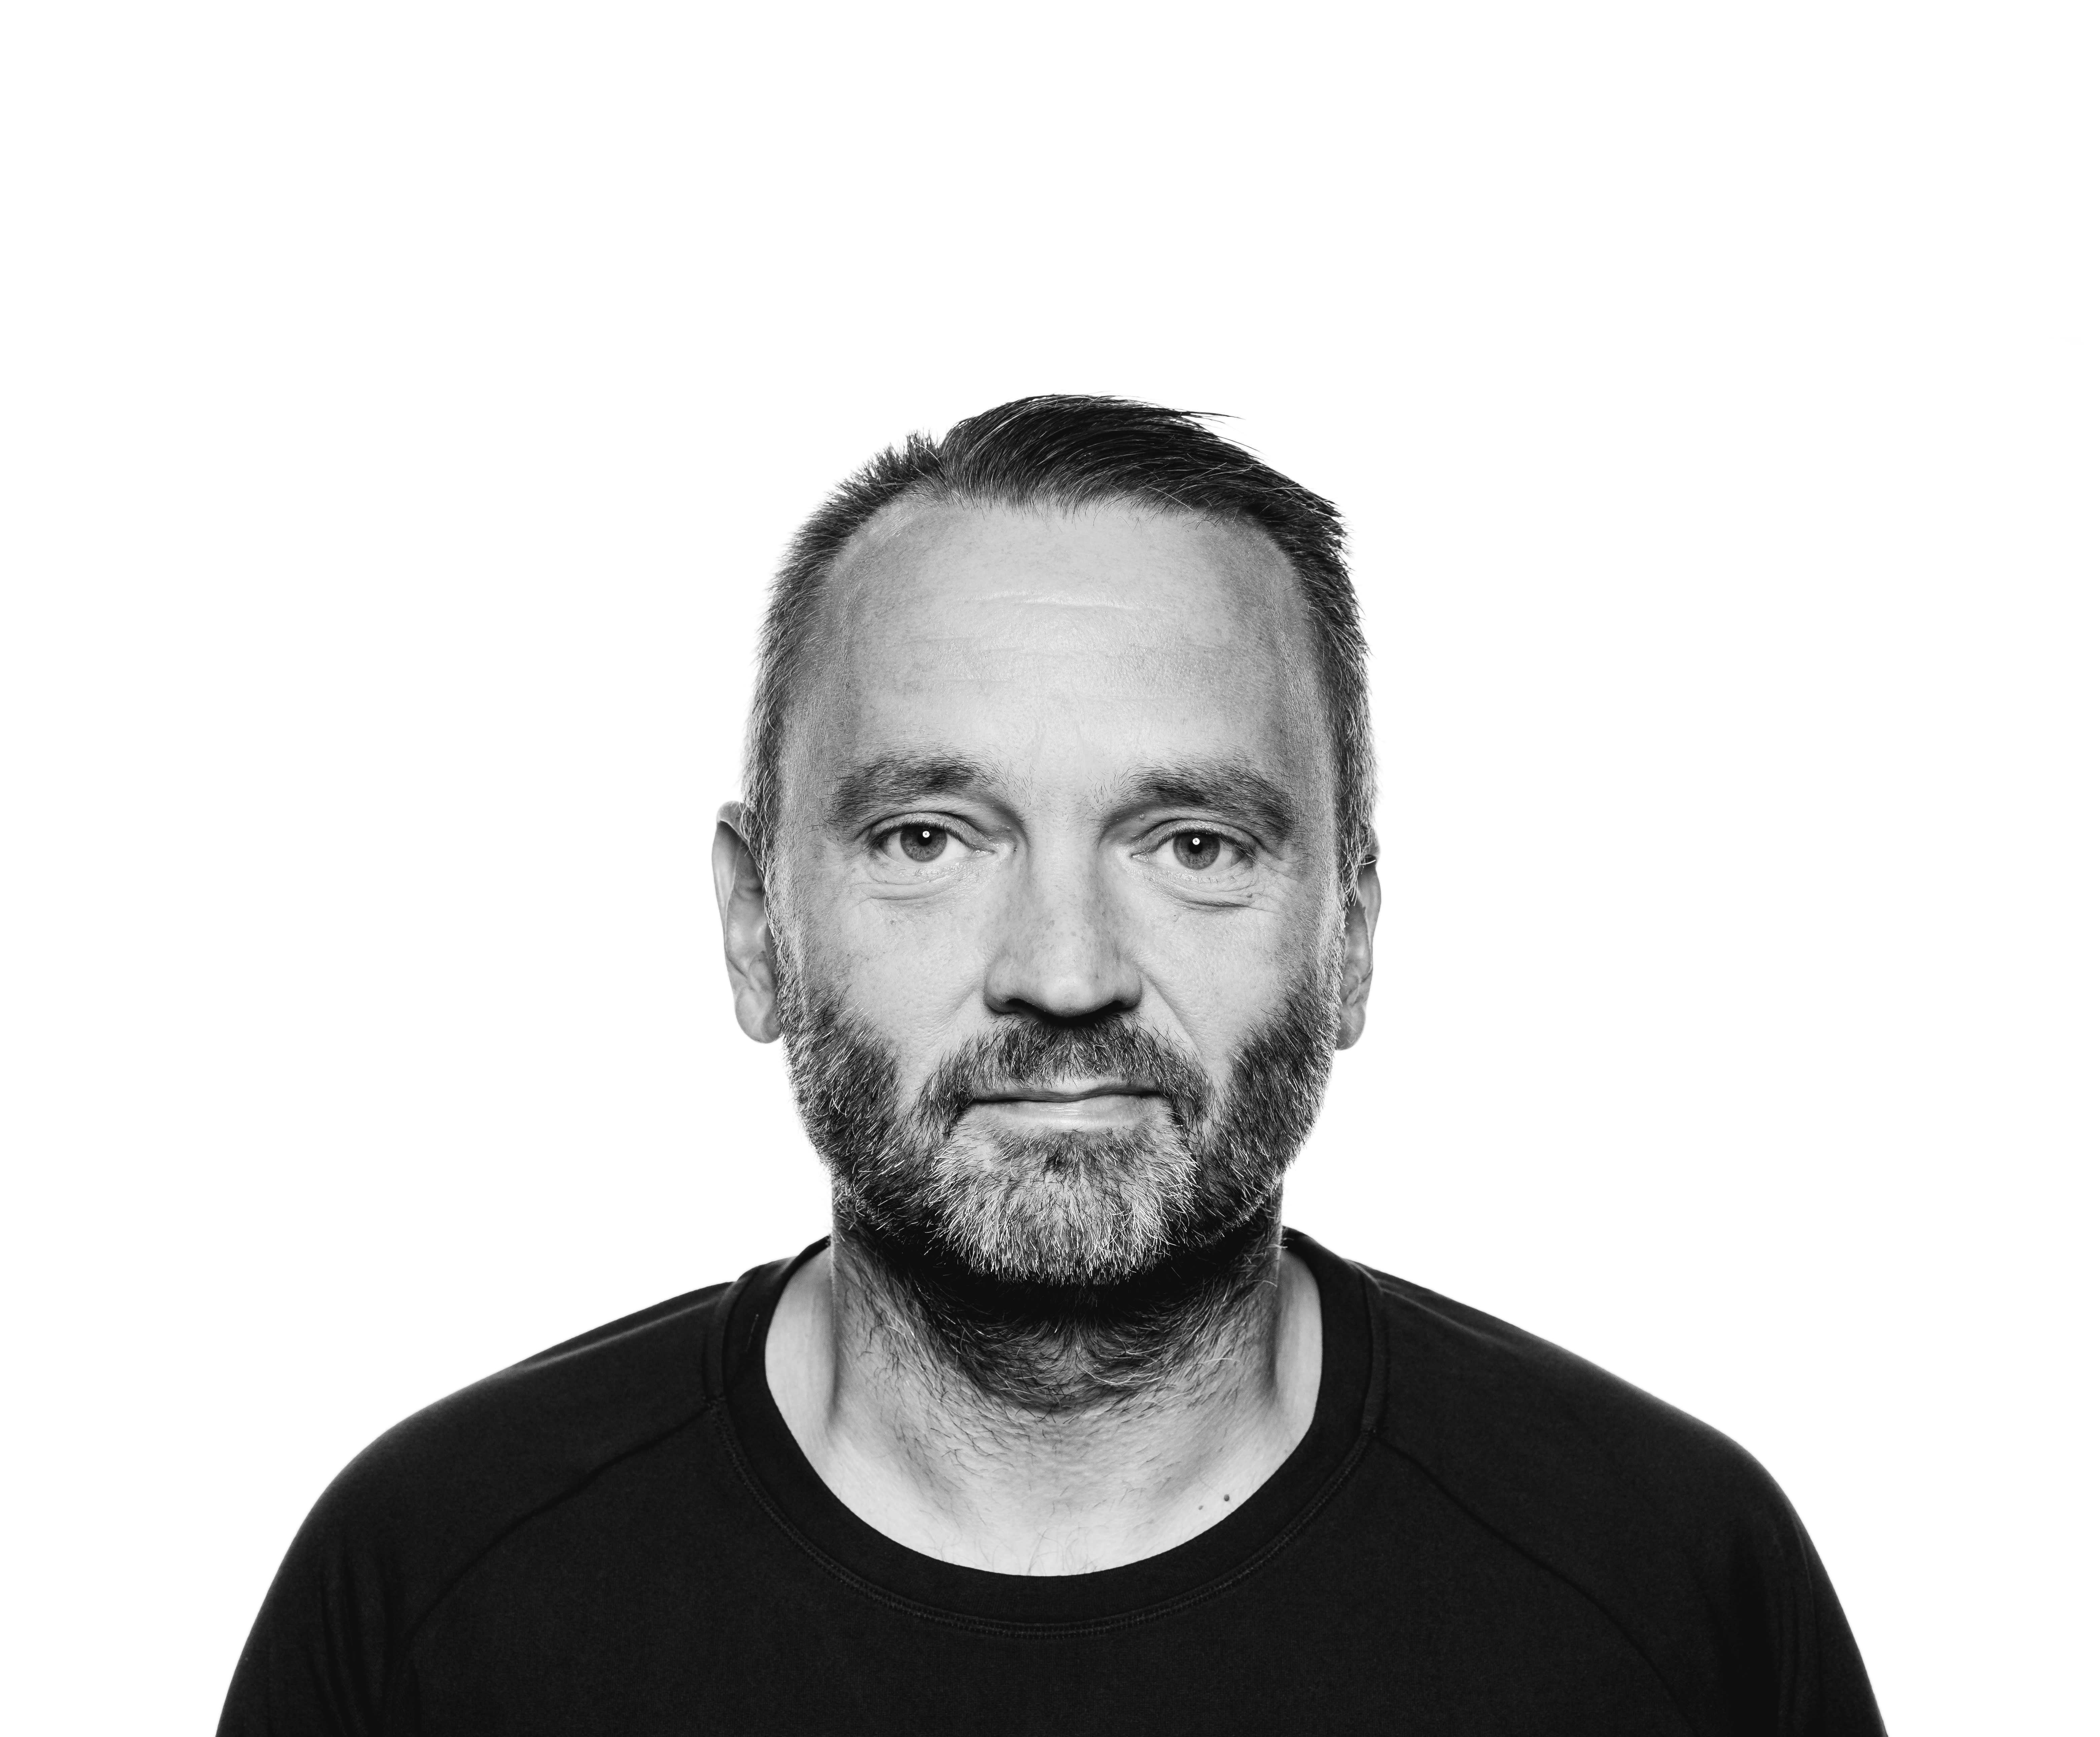 Ian Pedersen